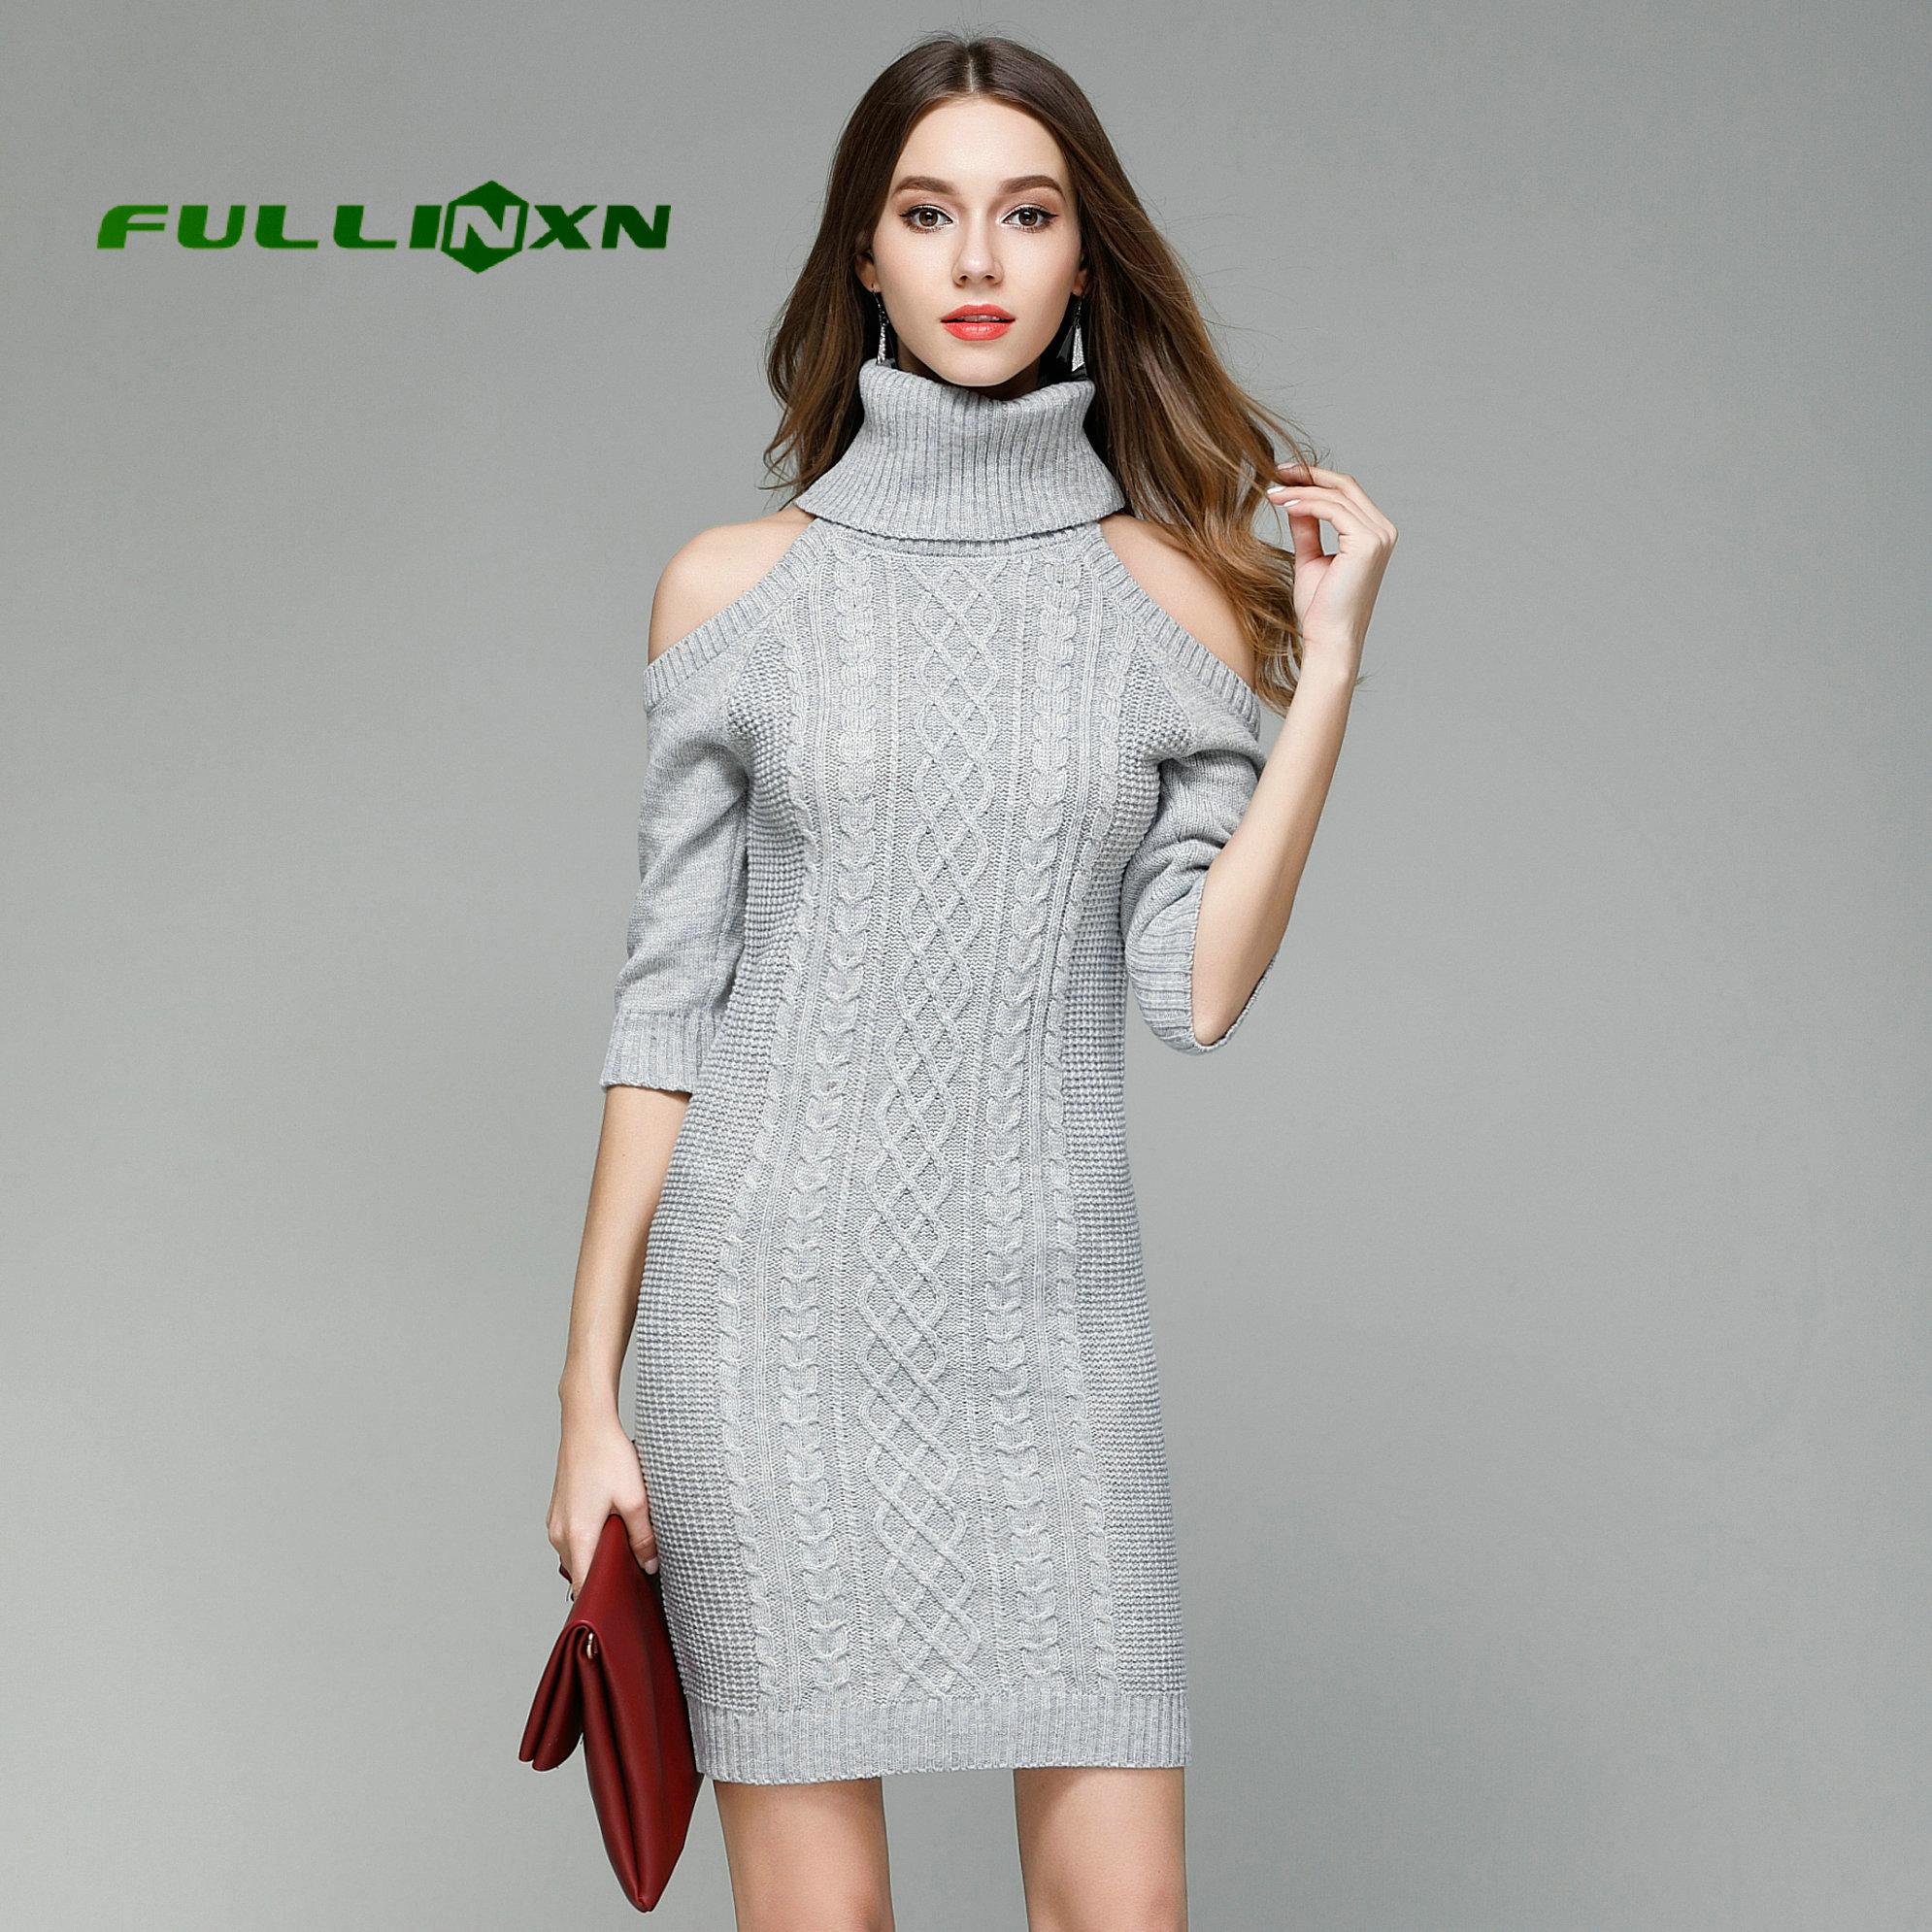 Argyle Sweater Dress Promotion-Shop for Promotional Argyle Sweater ...